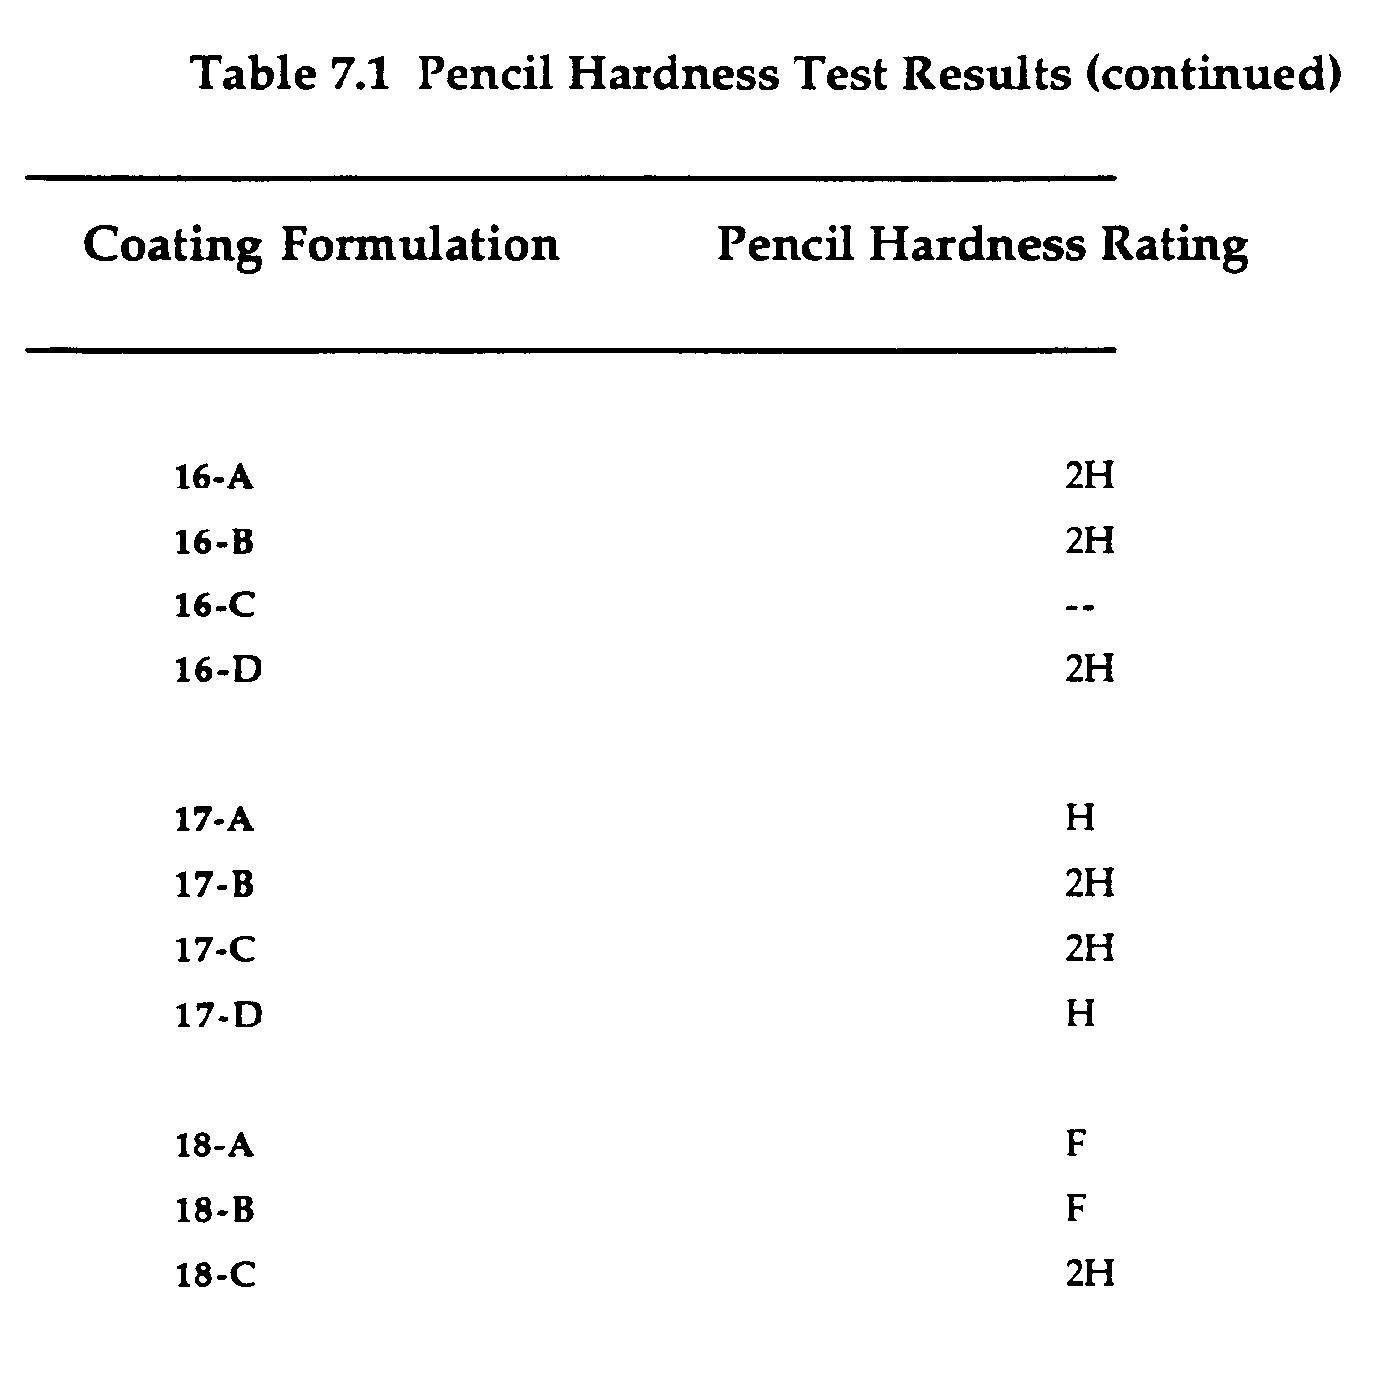 Madison : C 16 results